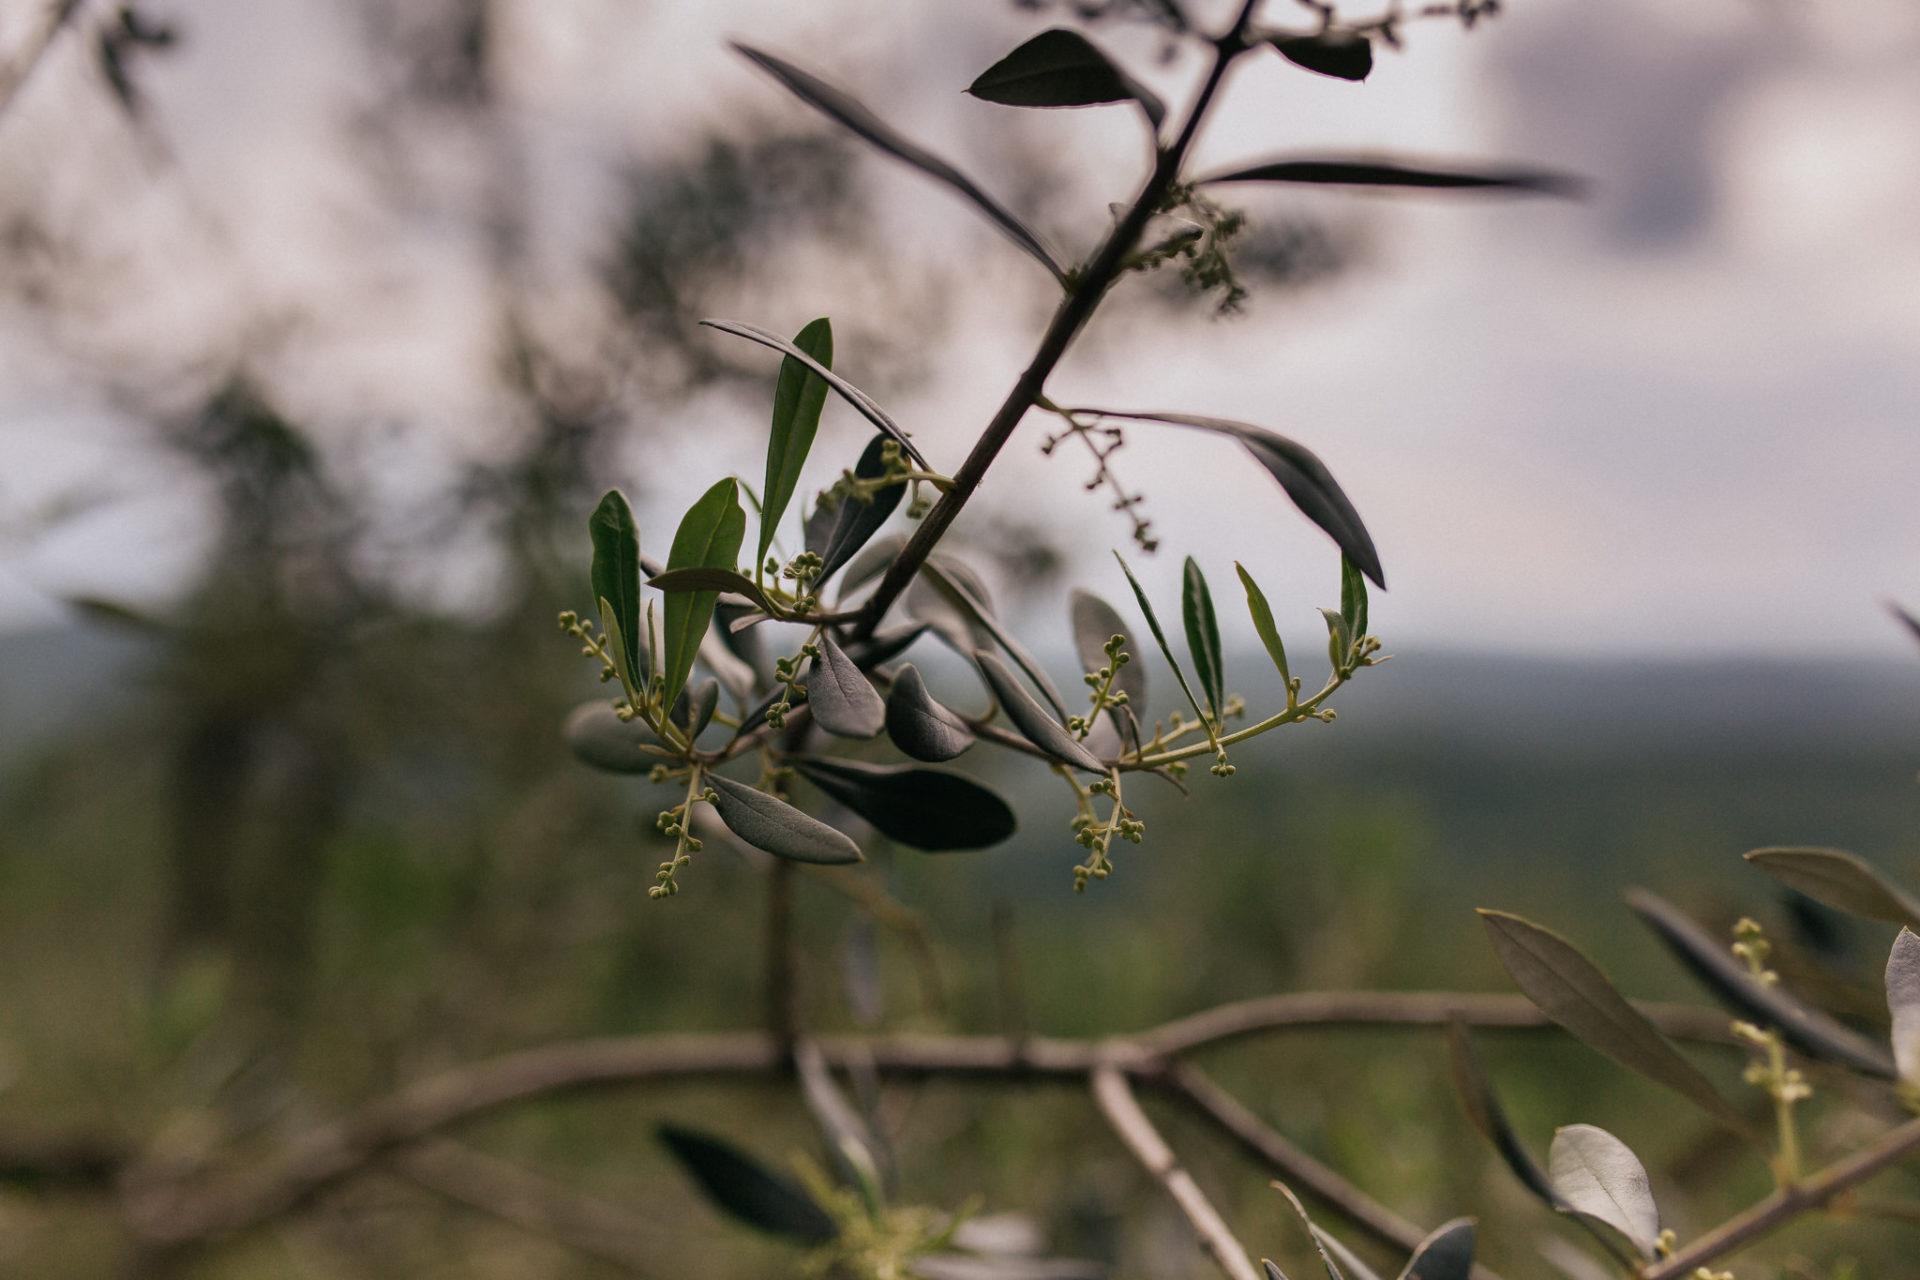 wedding photographer tuscany-italy road trip with dog-chianti region wineries hiking-organic vineyard-olive tree